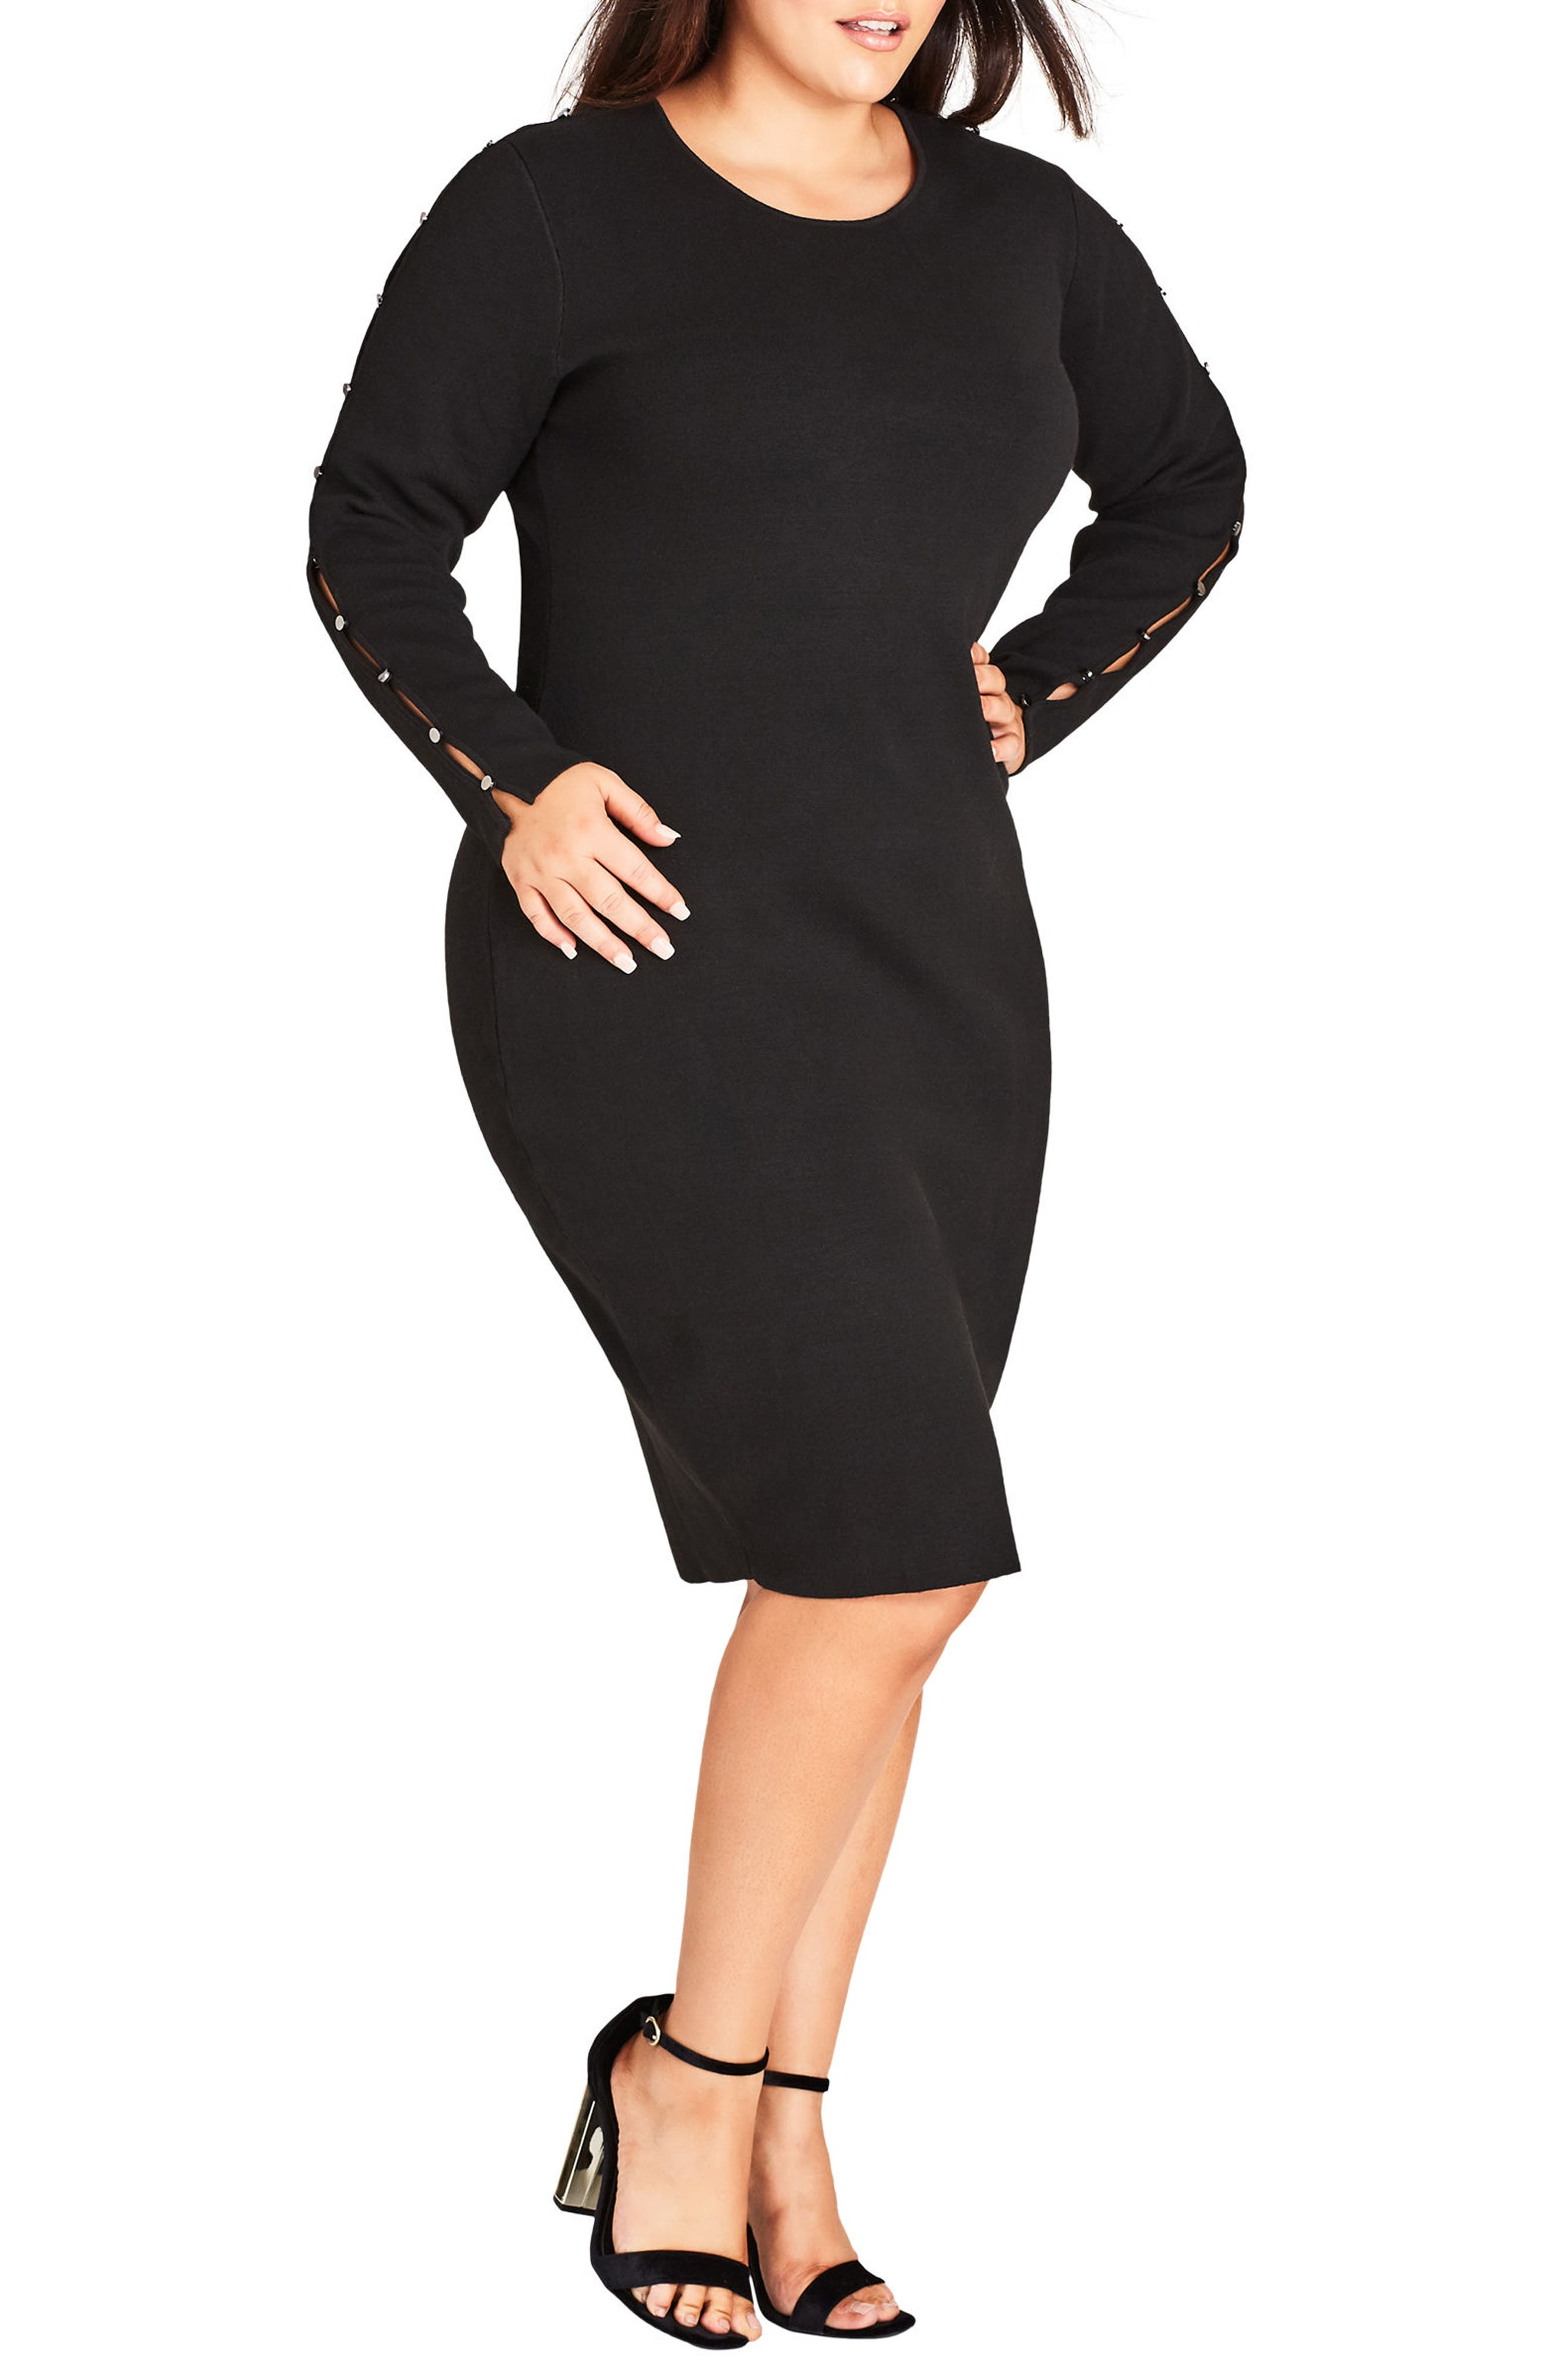 Stud Love Knit Dress,                         Main,                         color, BLACK